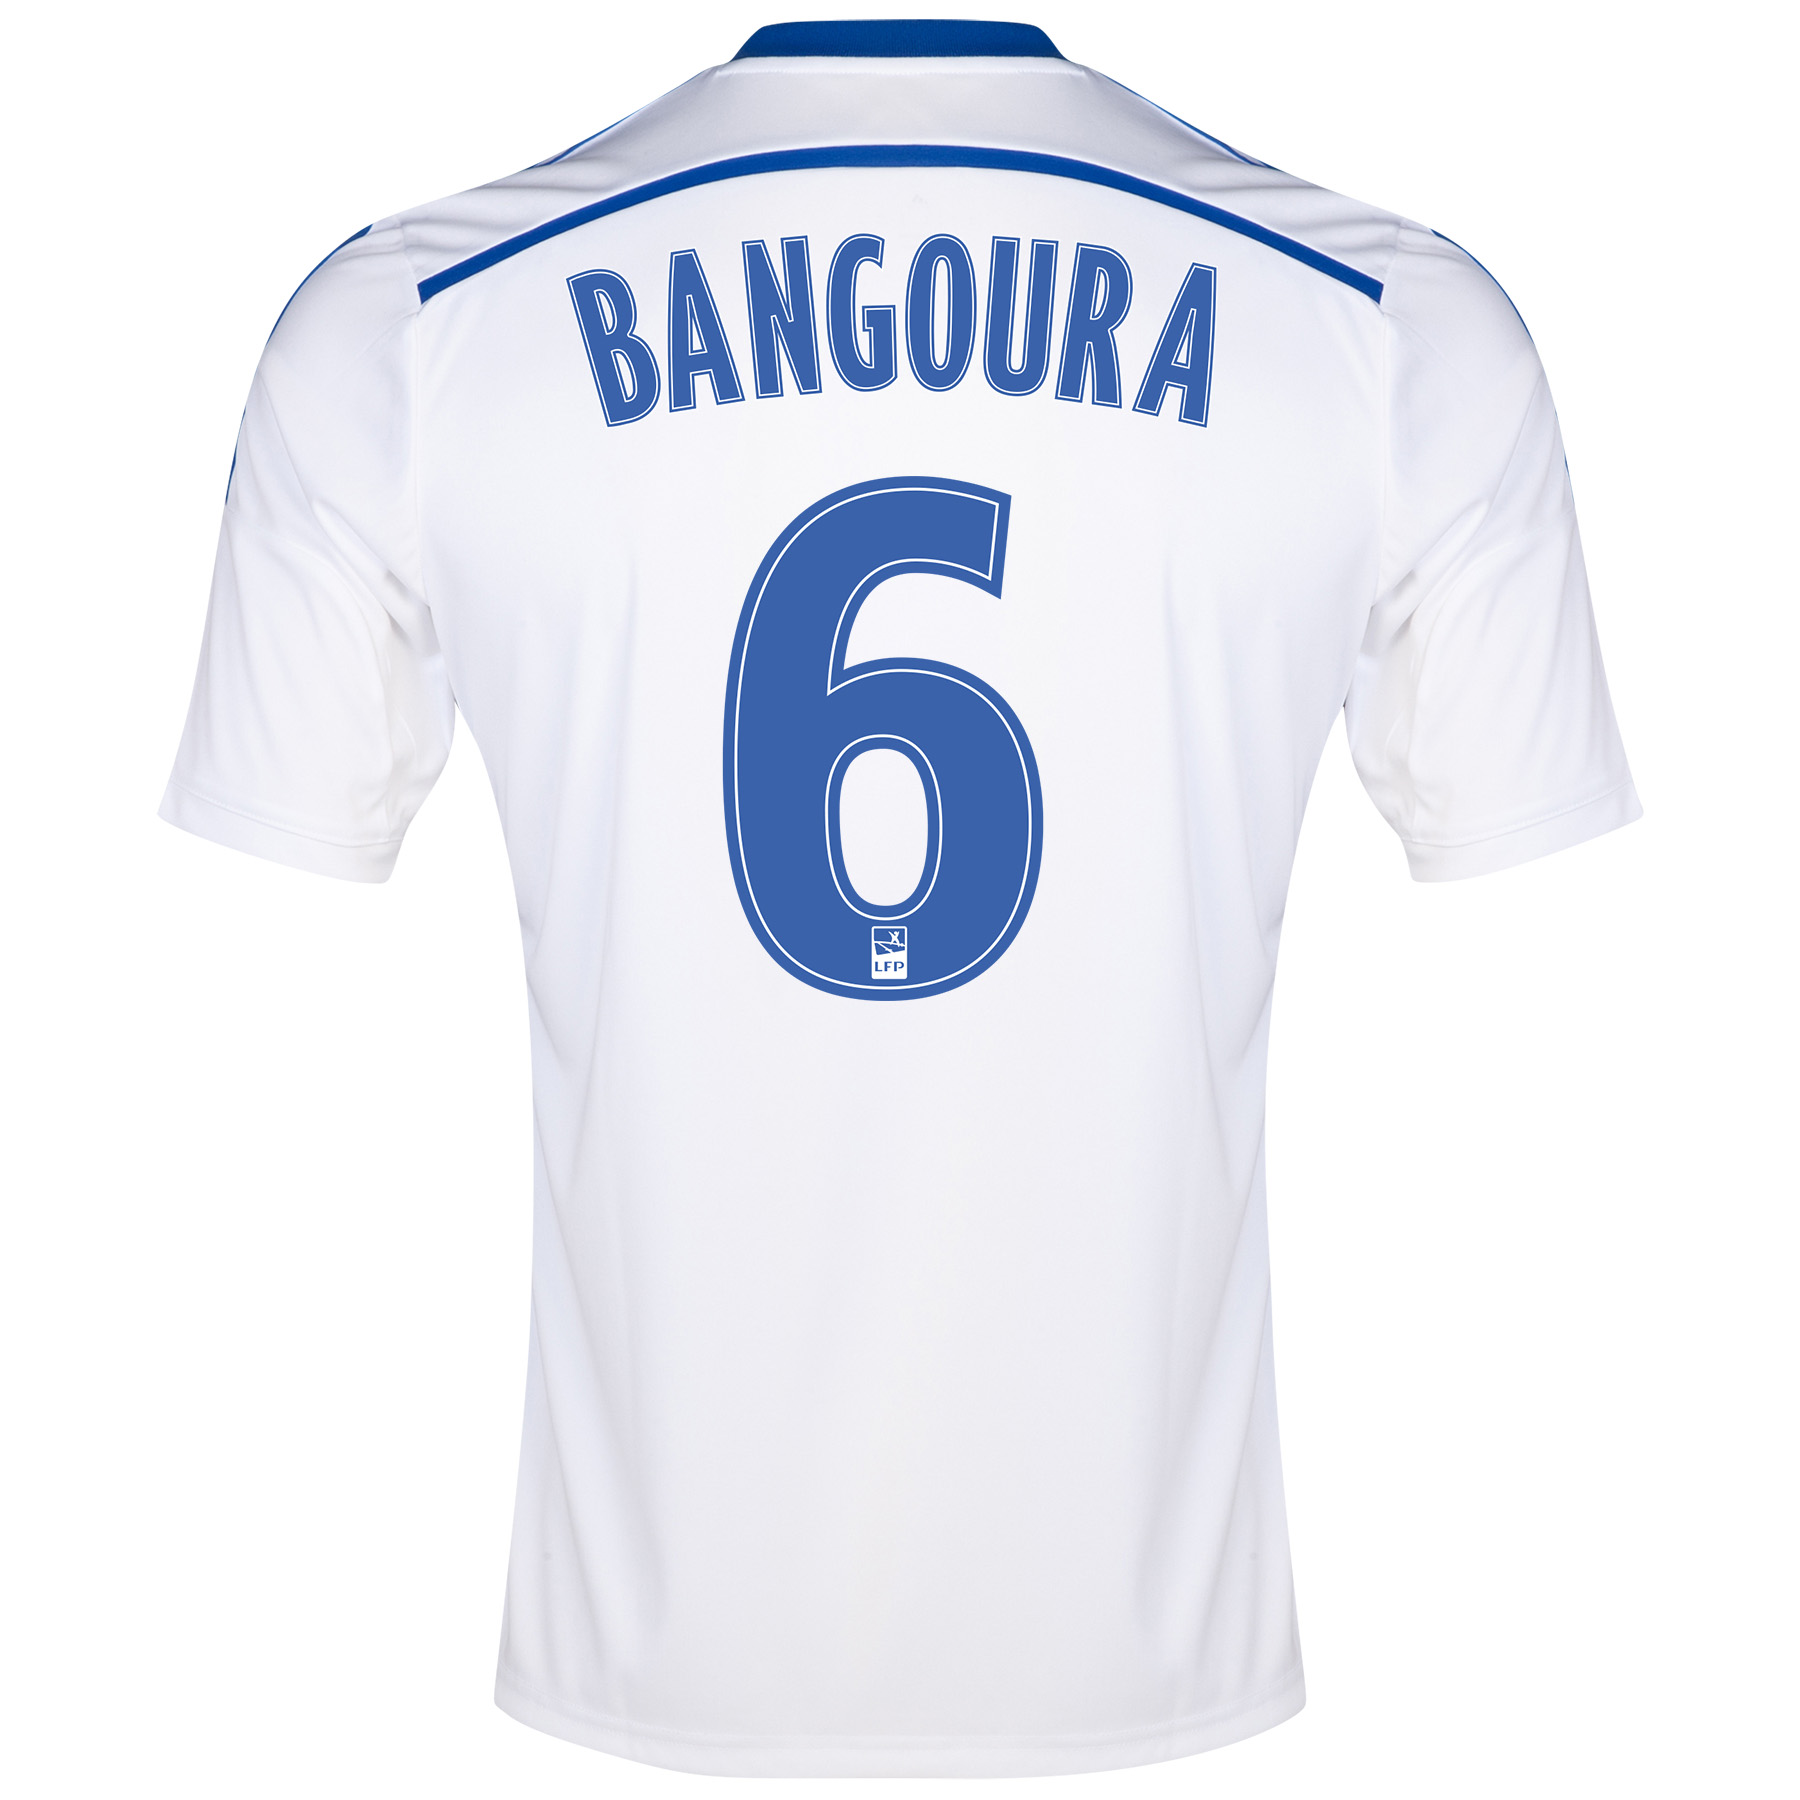 Olympique de Marseille Home Shirt Short Sleeve 2014/15 White with Bangoura 6 printing